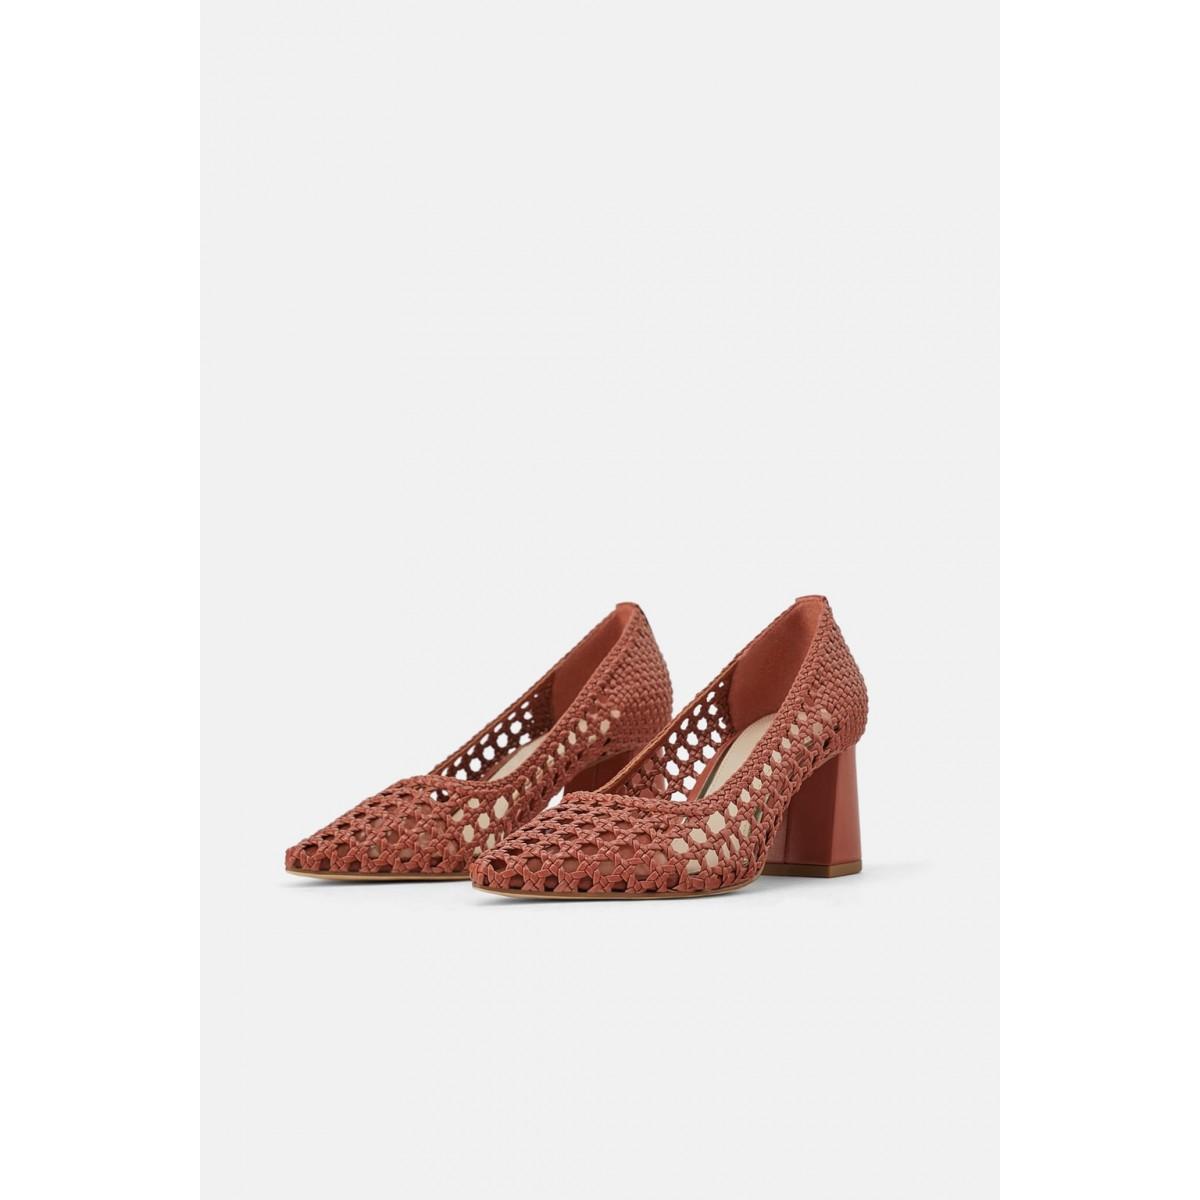 Zara Woven Wide Heeled